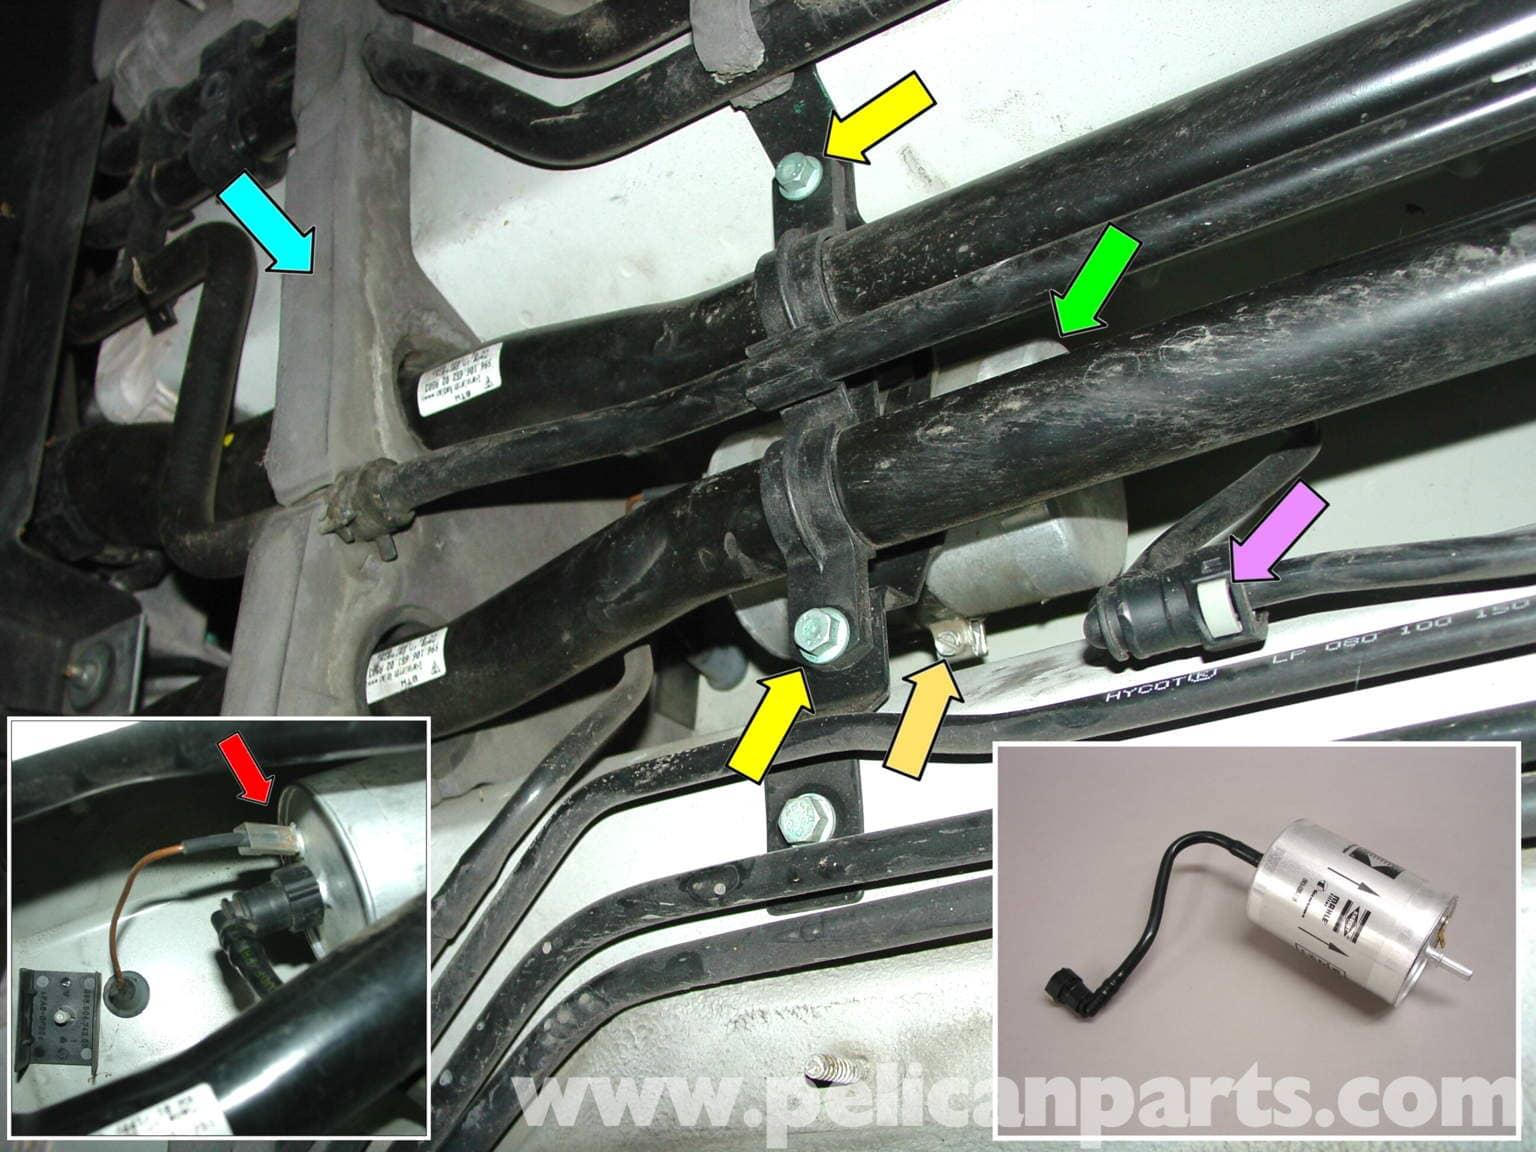 porsche 996 wiring diagram 2001    porsche    911 carrera fuel filter replacement    996     1998     porsche    911 carrera fuel filter replacement    996     1998